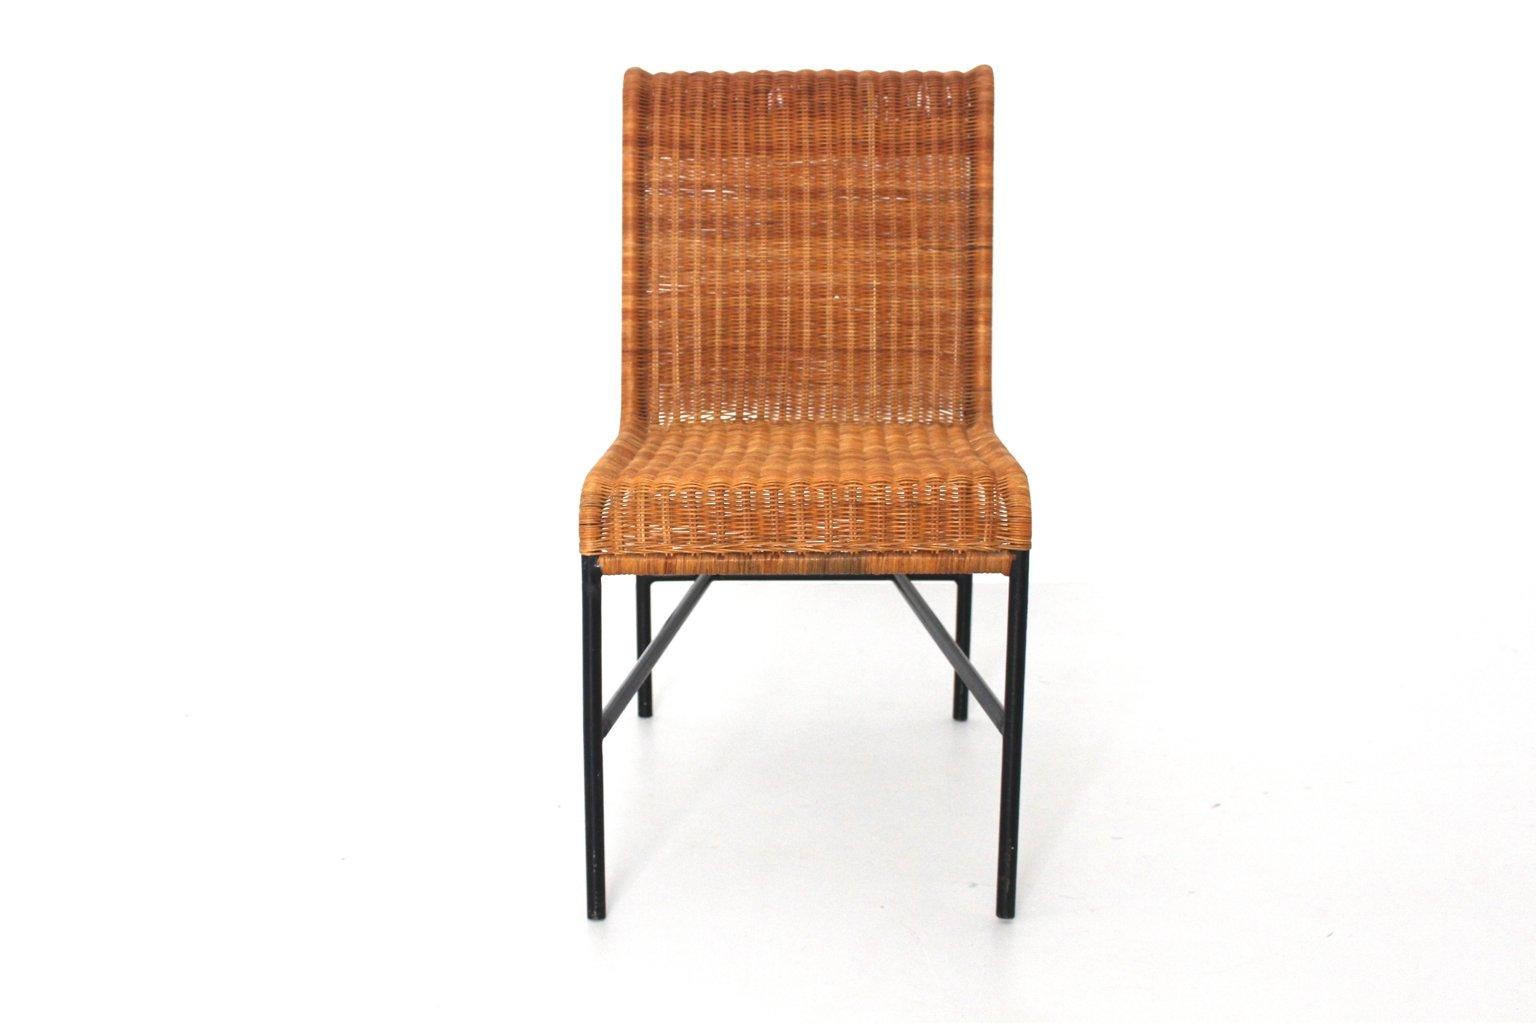 Mid Century Modern Rattan Chair By Harold Cohen And Davis Pratt, 1953